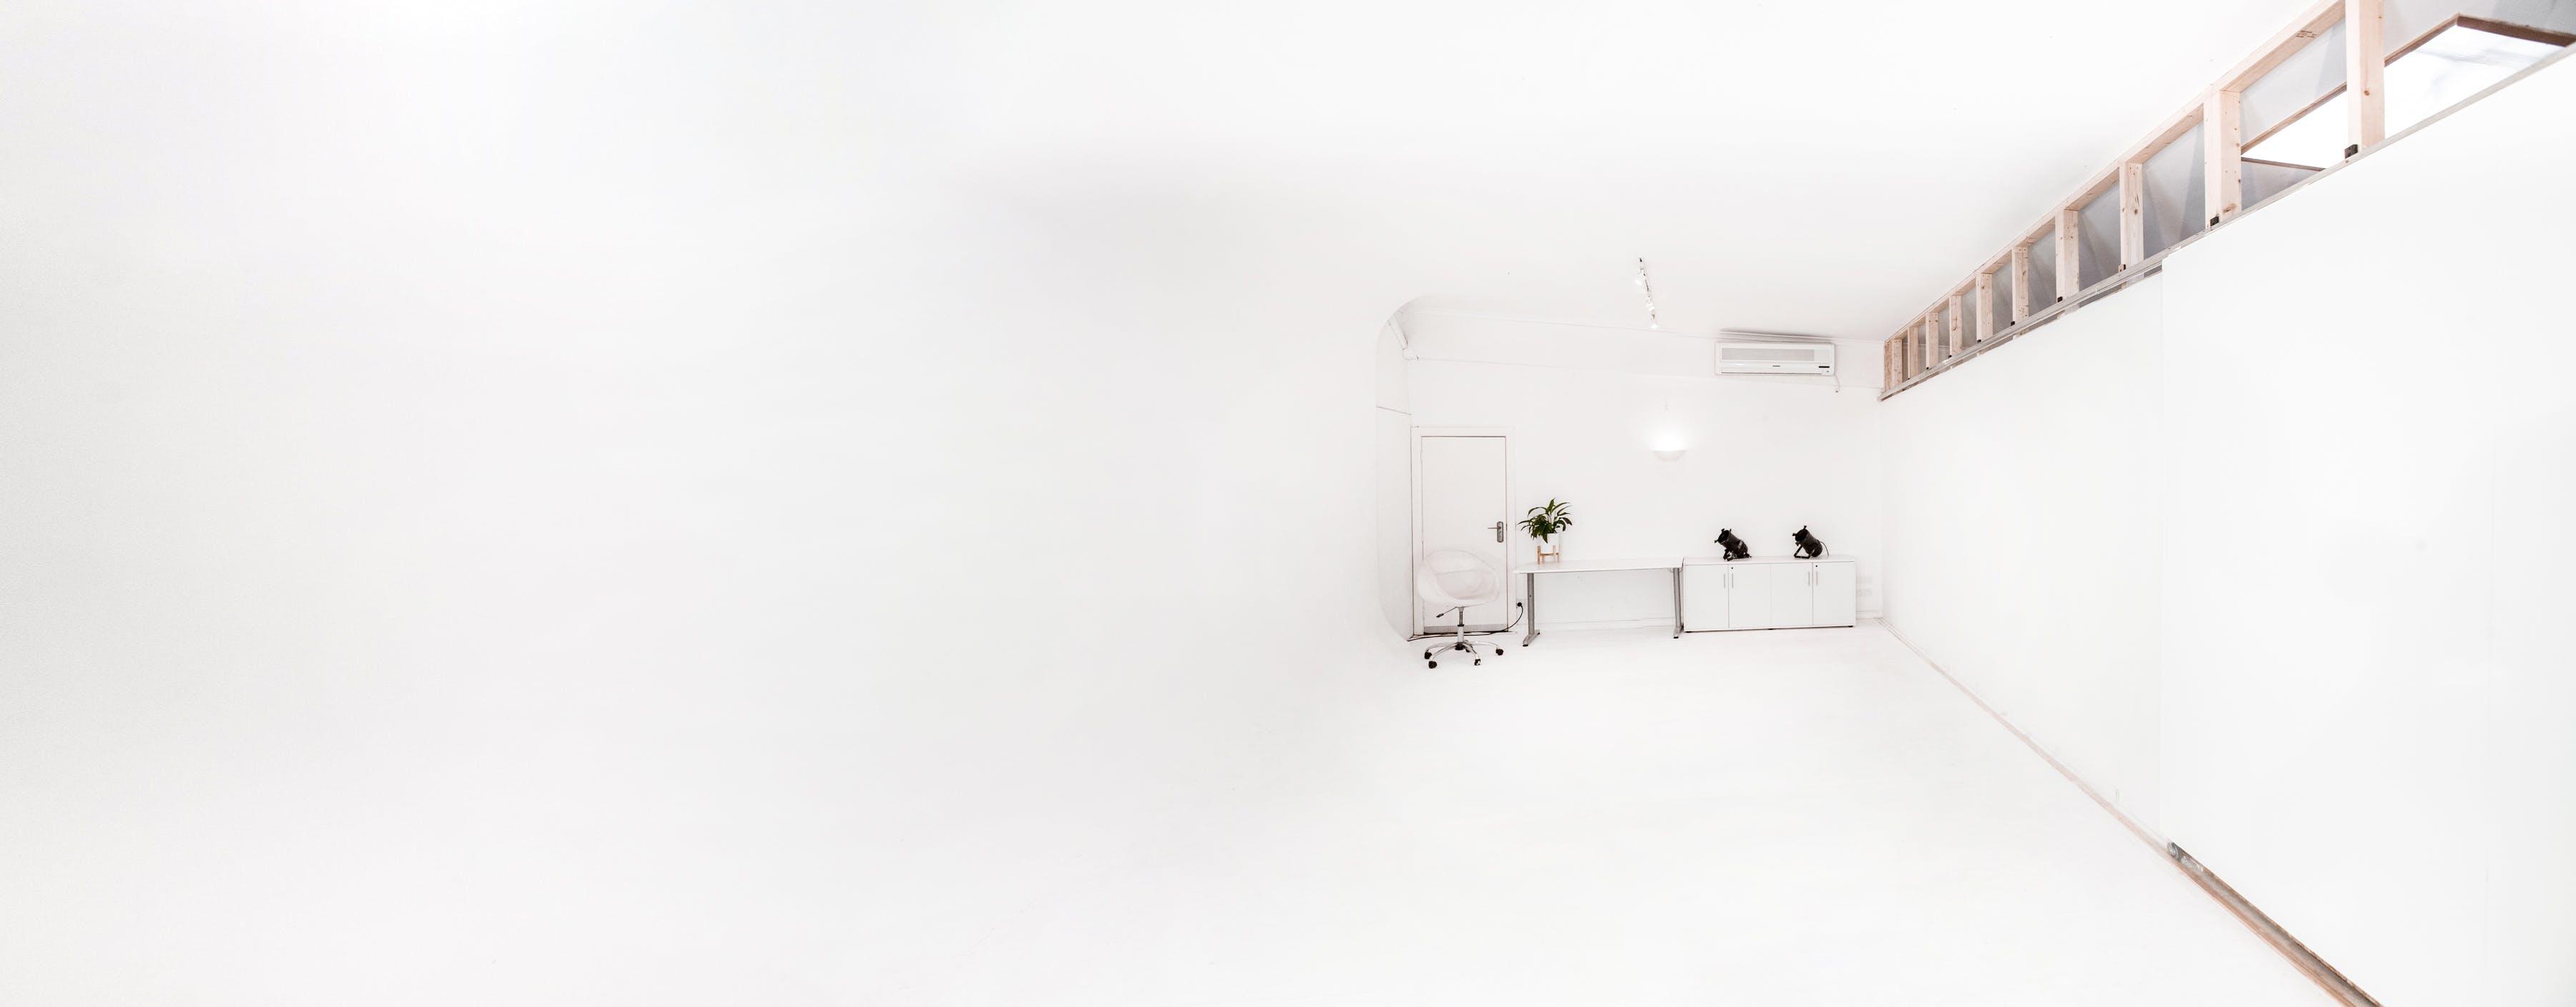 Photography Studio, creative studio at Kindred Studios, image 1